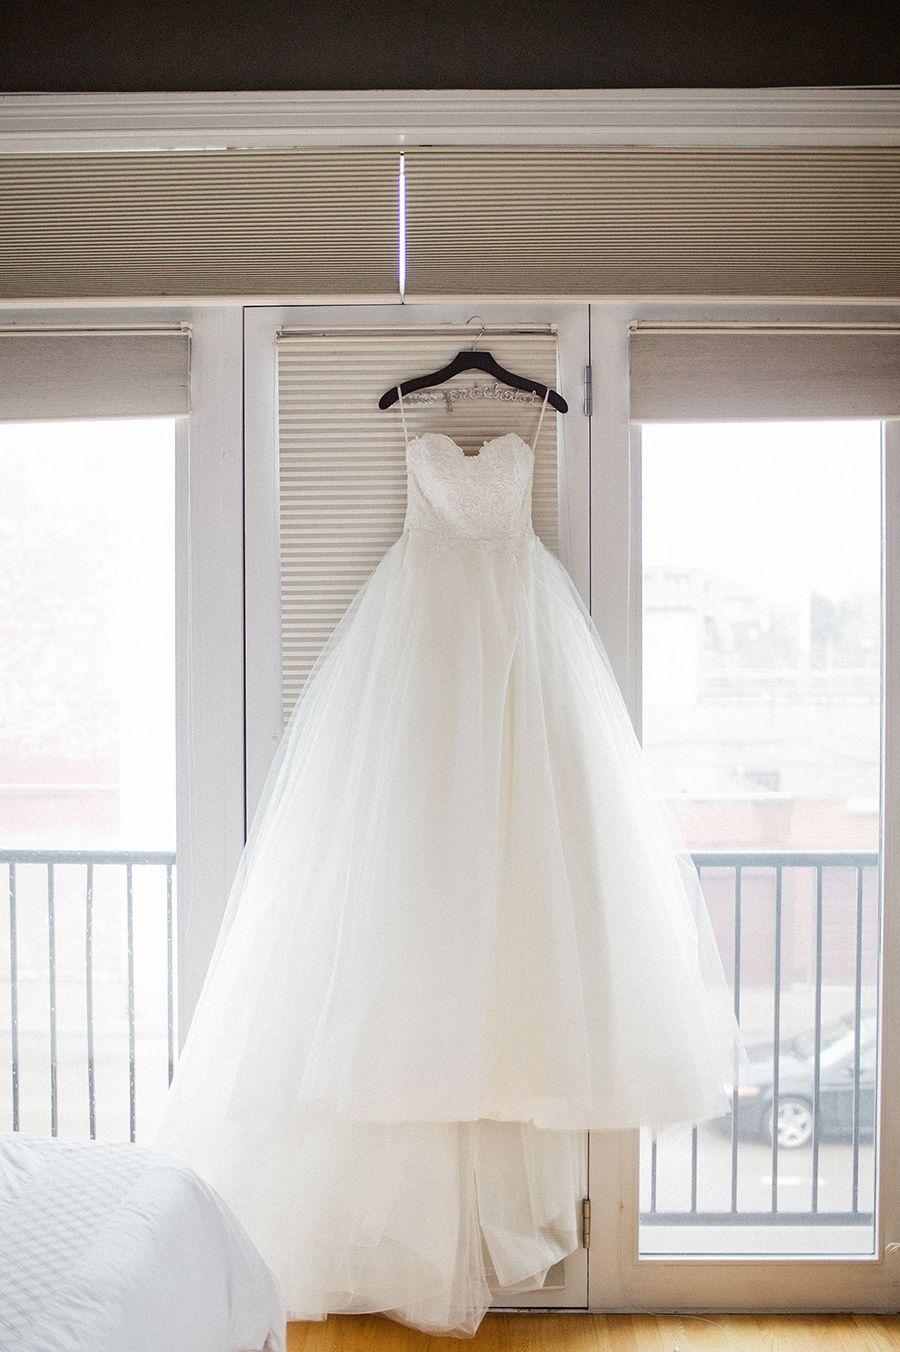 Chicago wedding dresses  Timeless  Classic Chicago Wedding  weddings galore  Pinterest